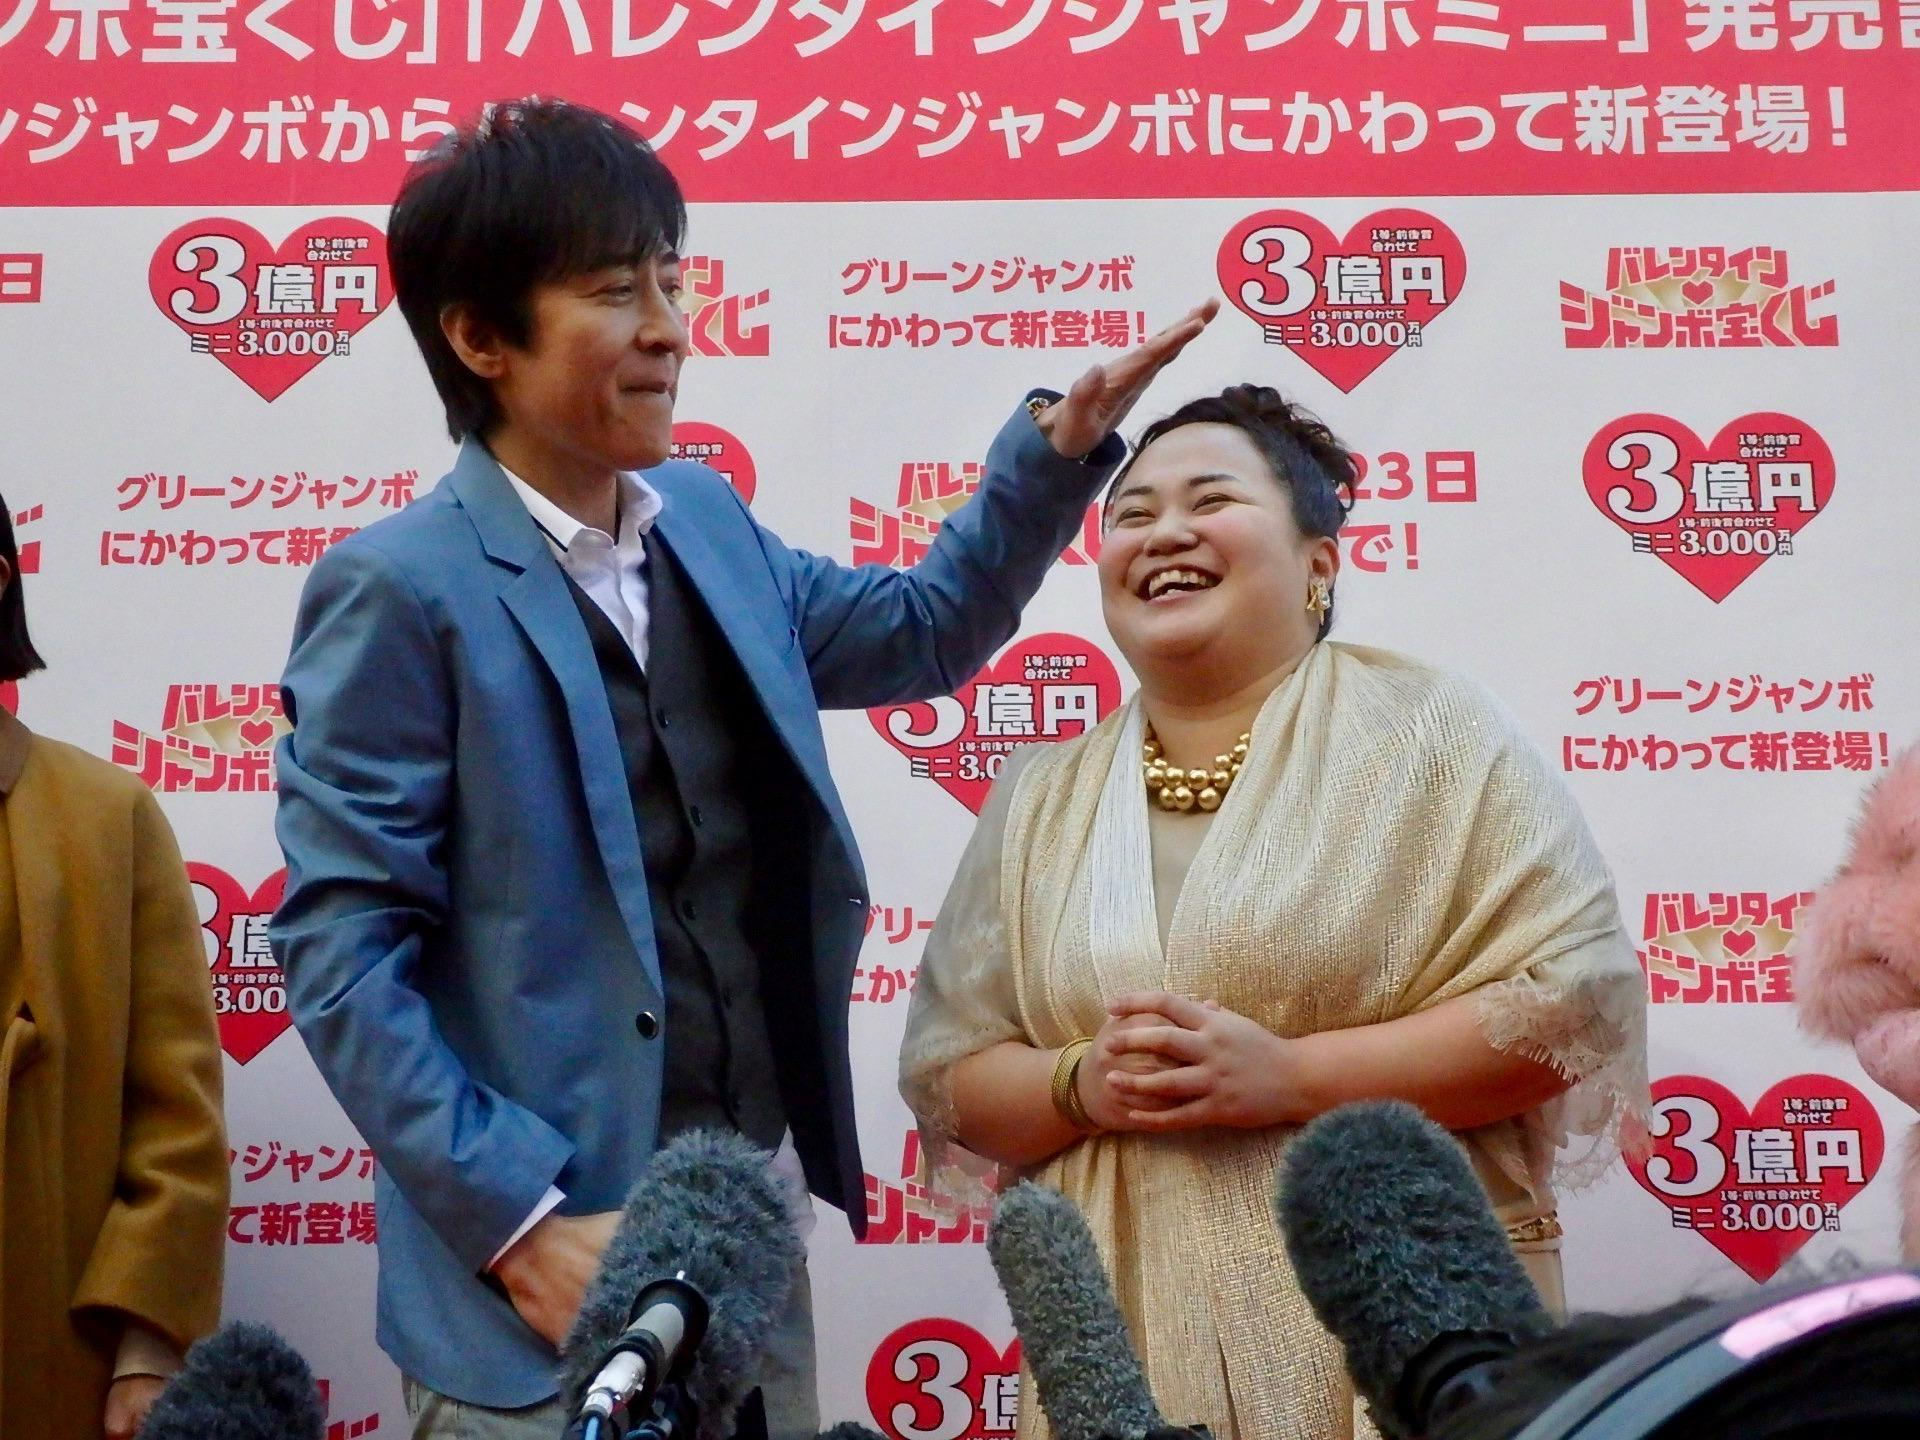 http://news.yoshimoto.co.jp/20180131180939-3ff20f68b3ff435b1dd80aeacedacc09521f71d2.jpg